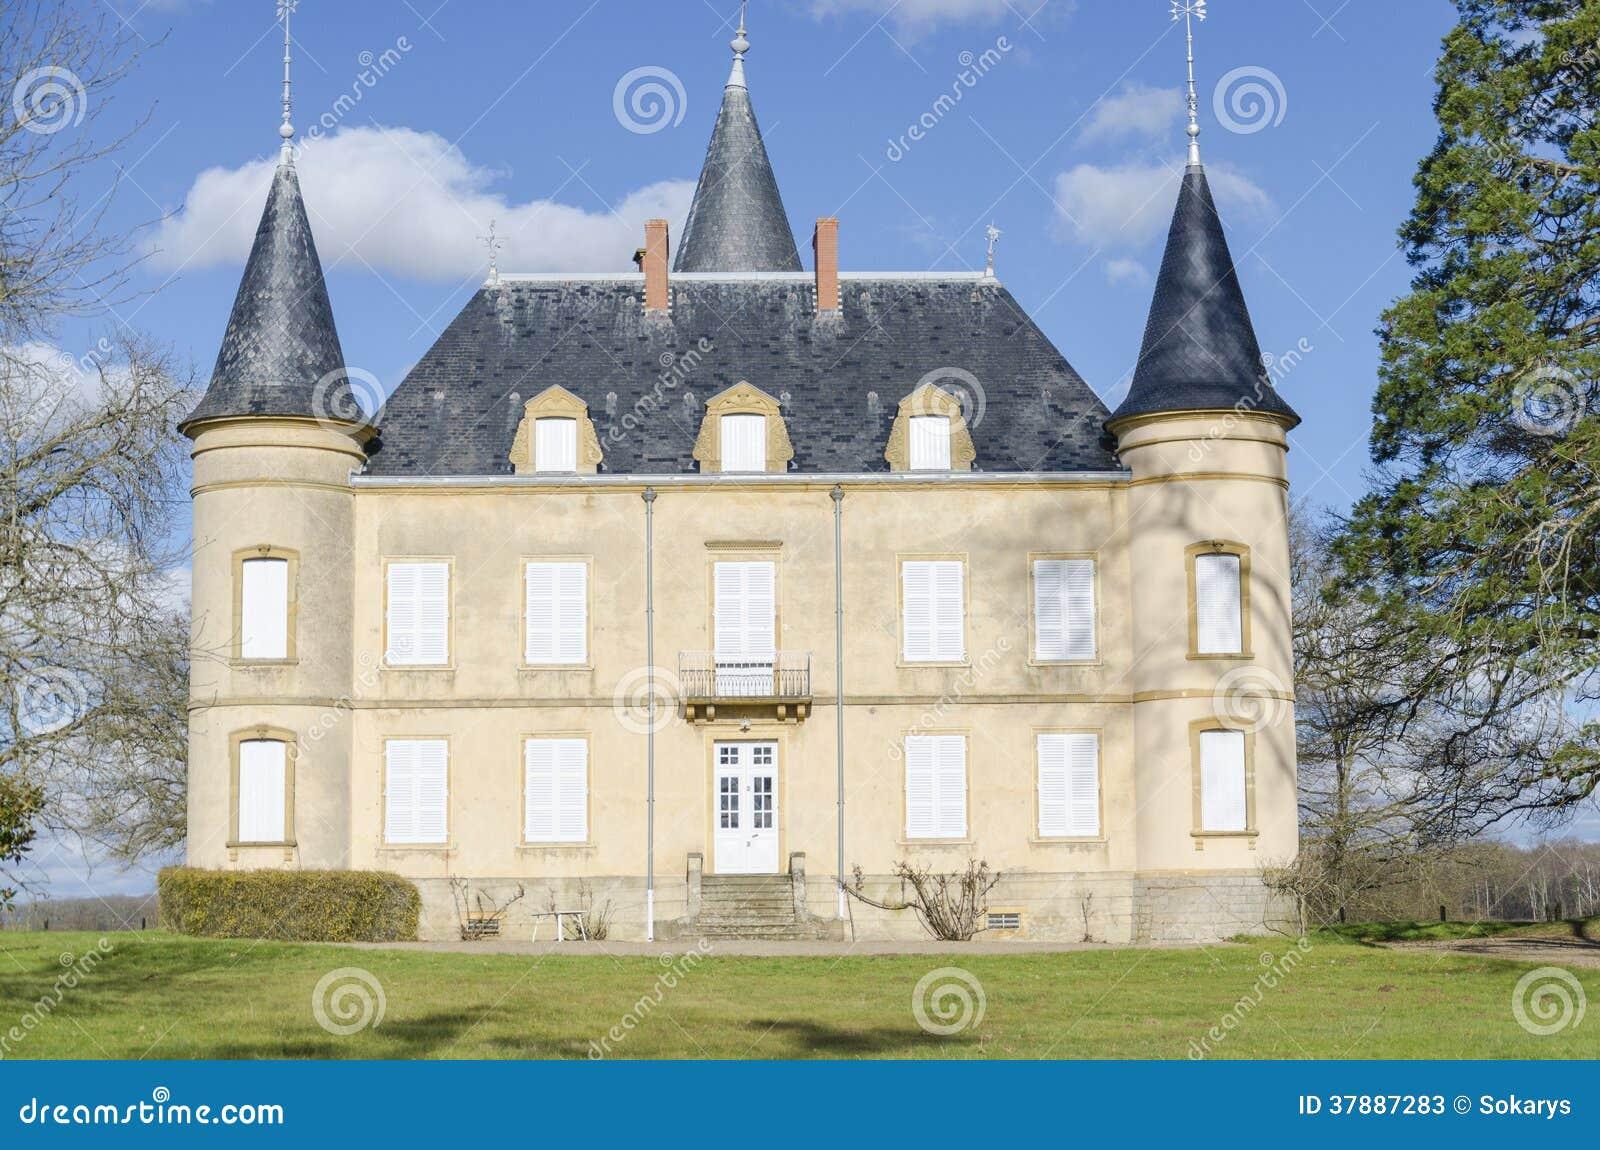 Kasteel van Clessy, Bourgondië, Frankrijk, saone-et-Loire